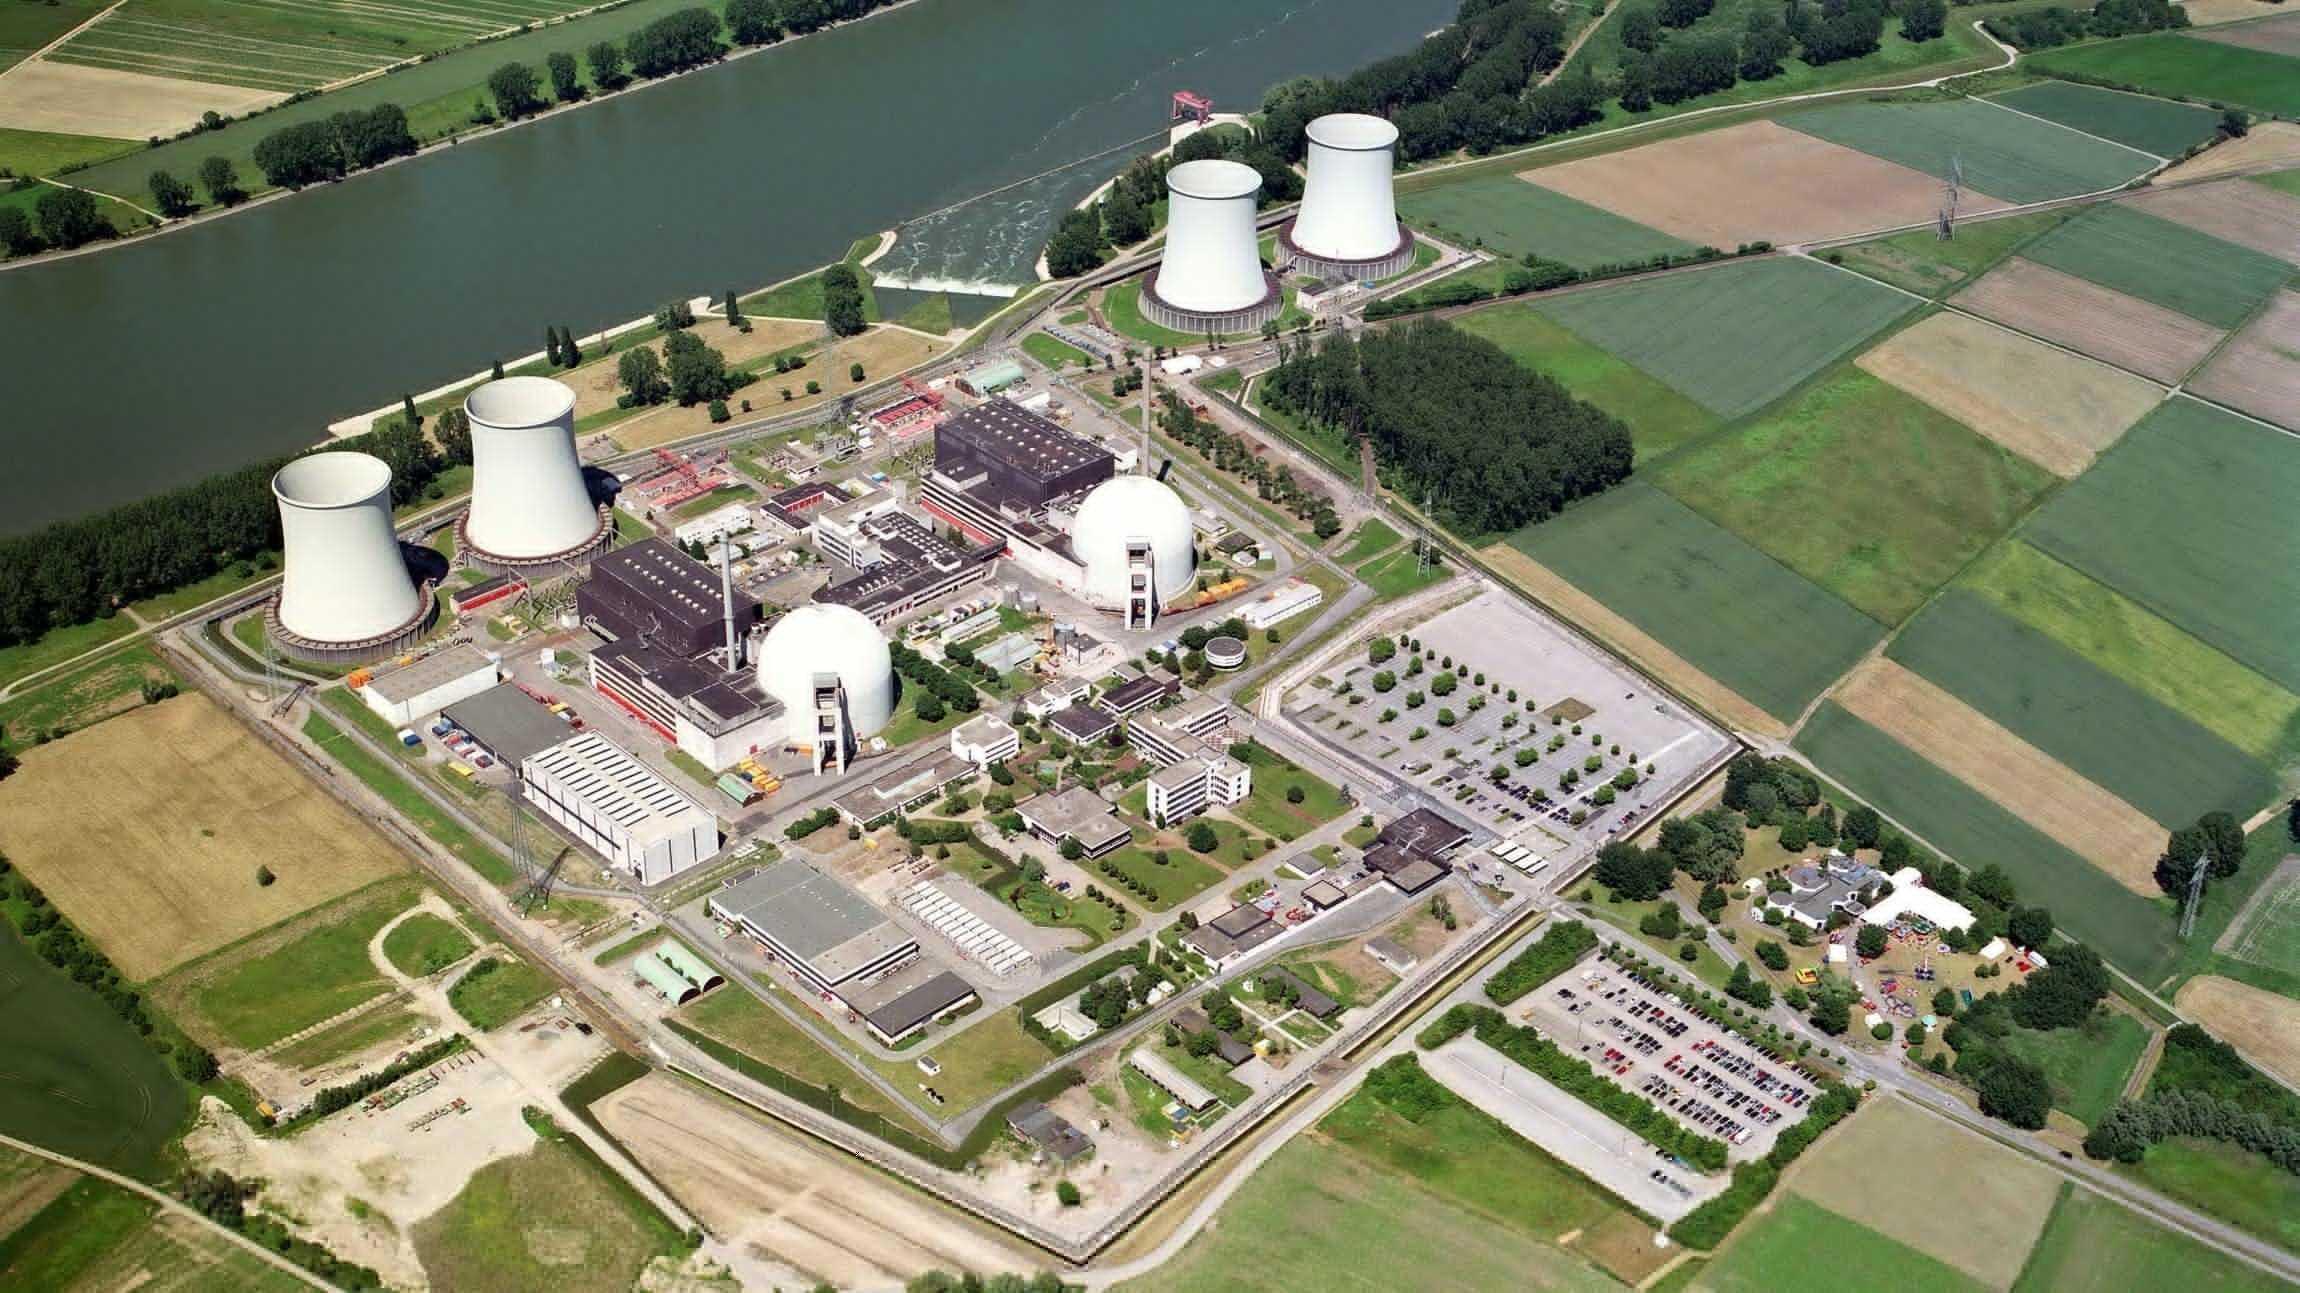 AKW-Rückbau in Biblis: Atomkraftwerk-Silhouette bleibt